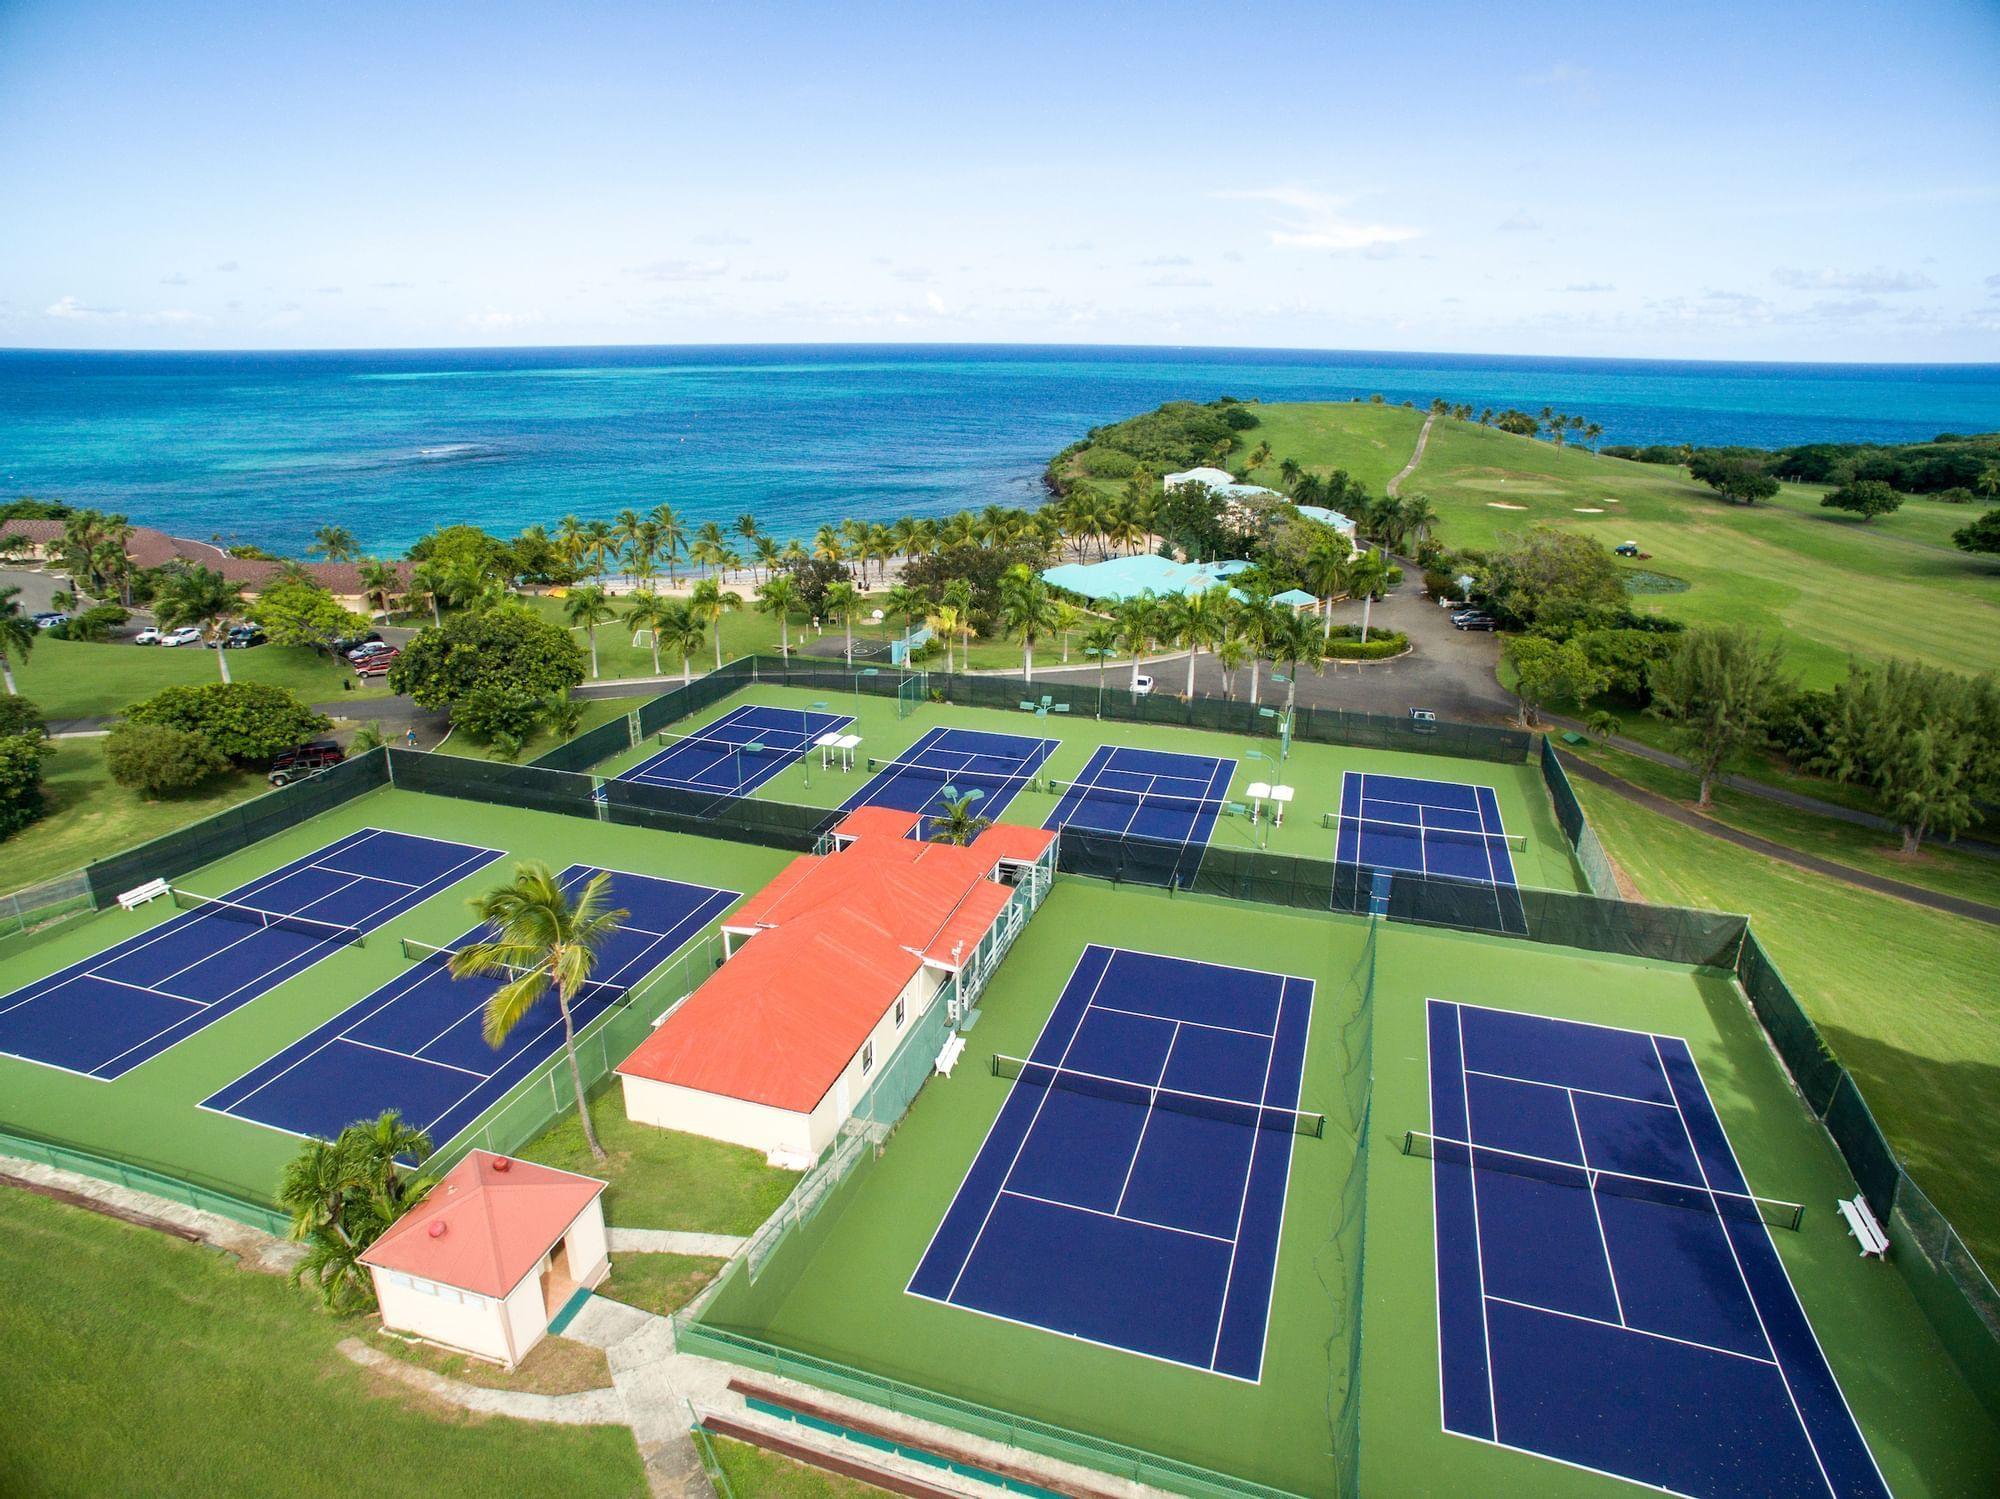 Tennis Courts